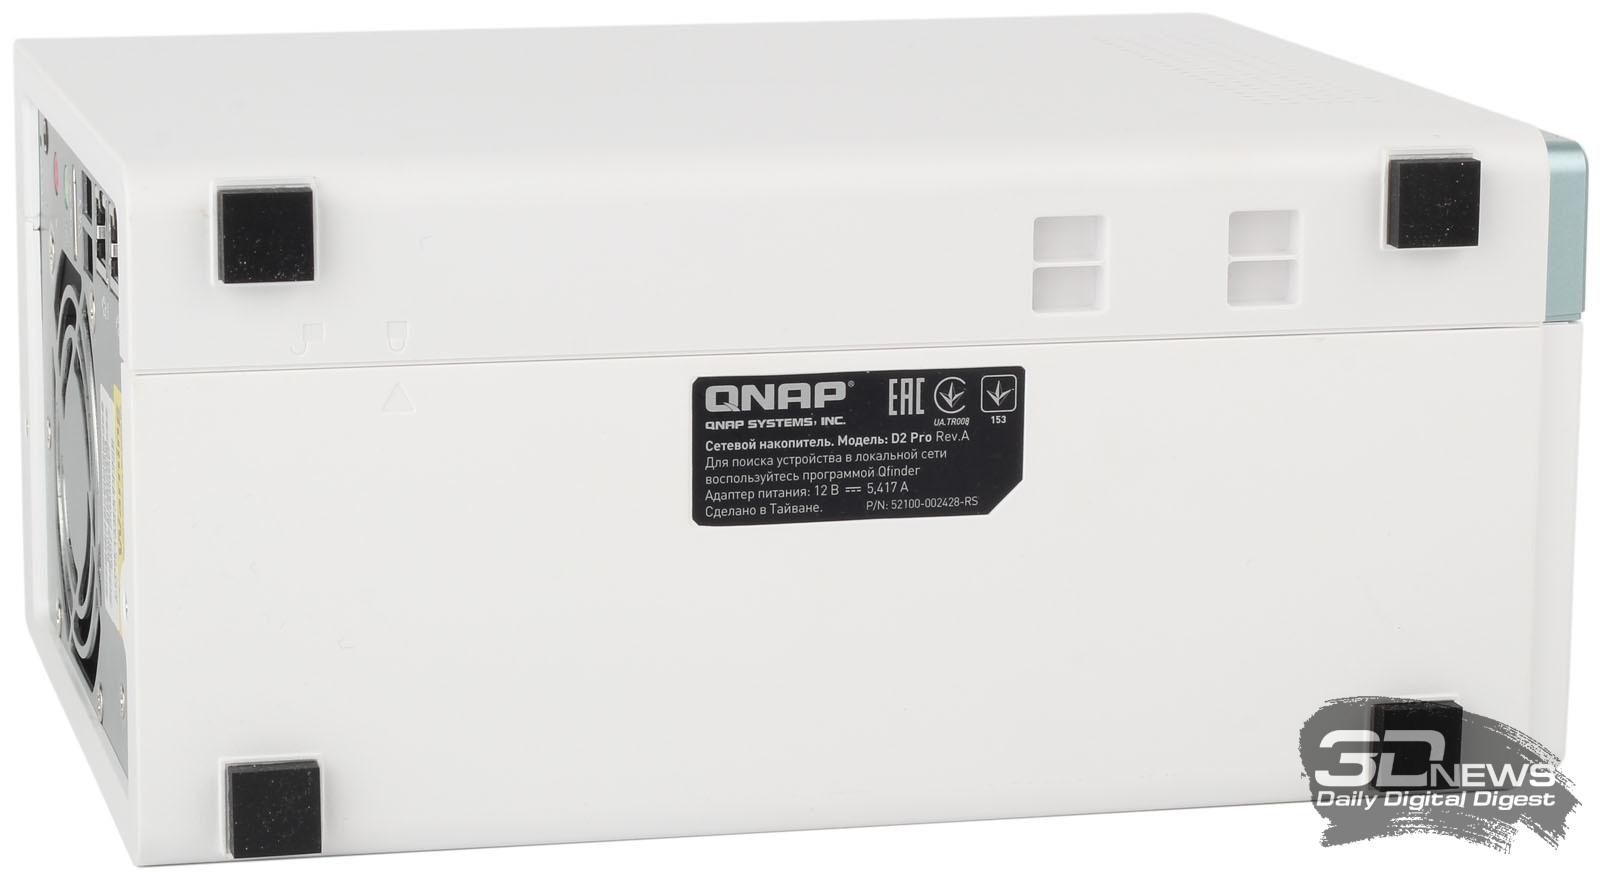 Обзор QNAP D2 Pro: свежий взгляд на домашний NAS / Накопители